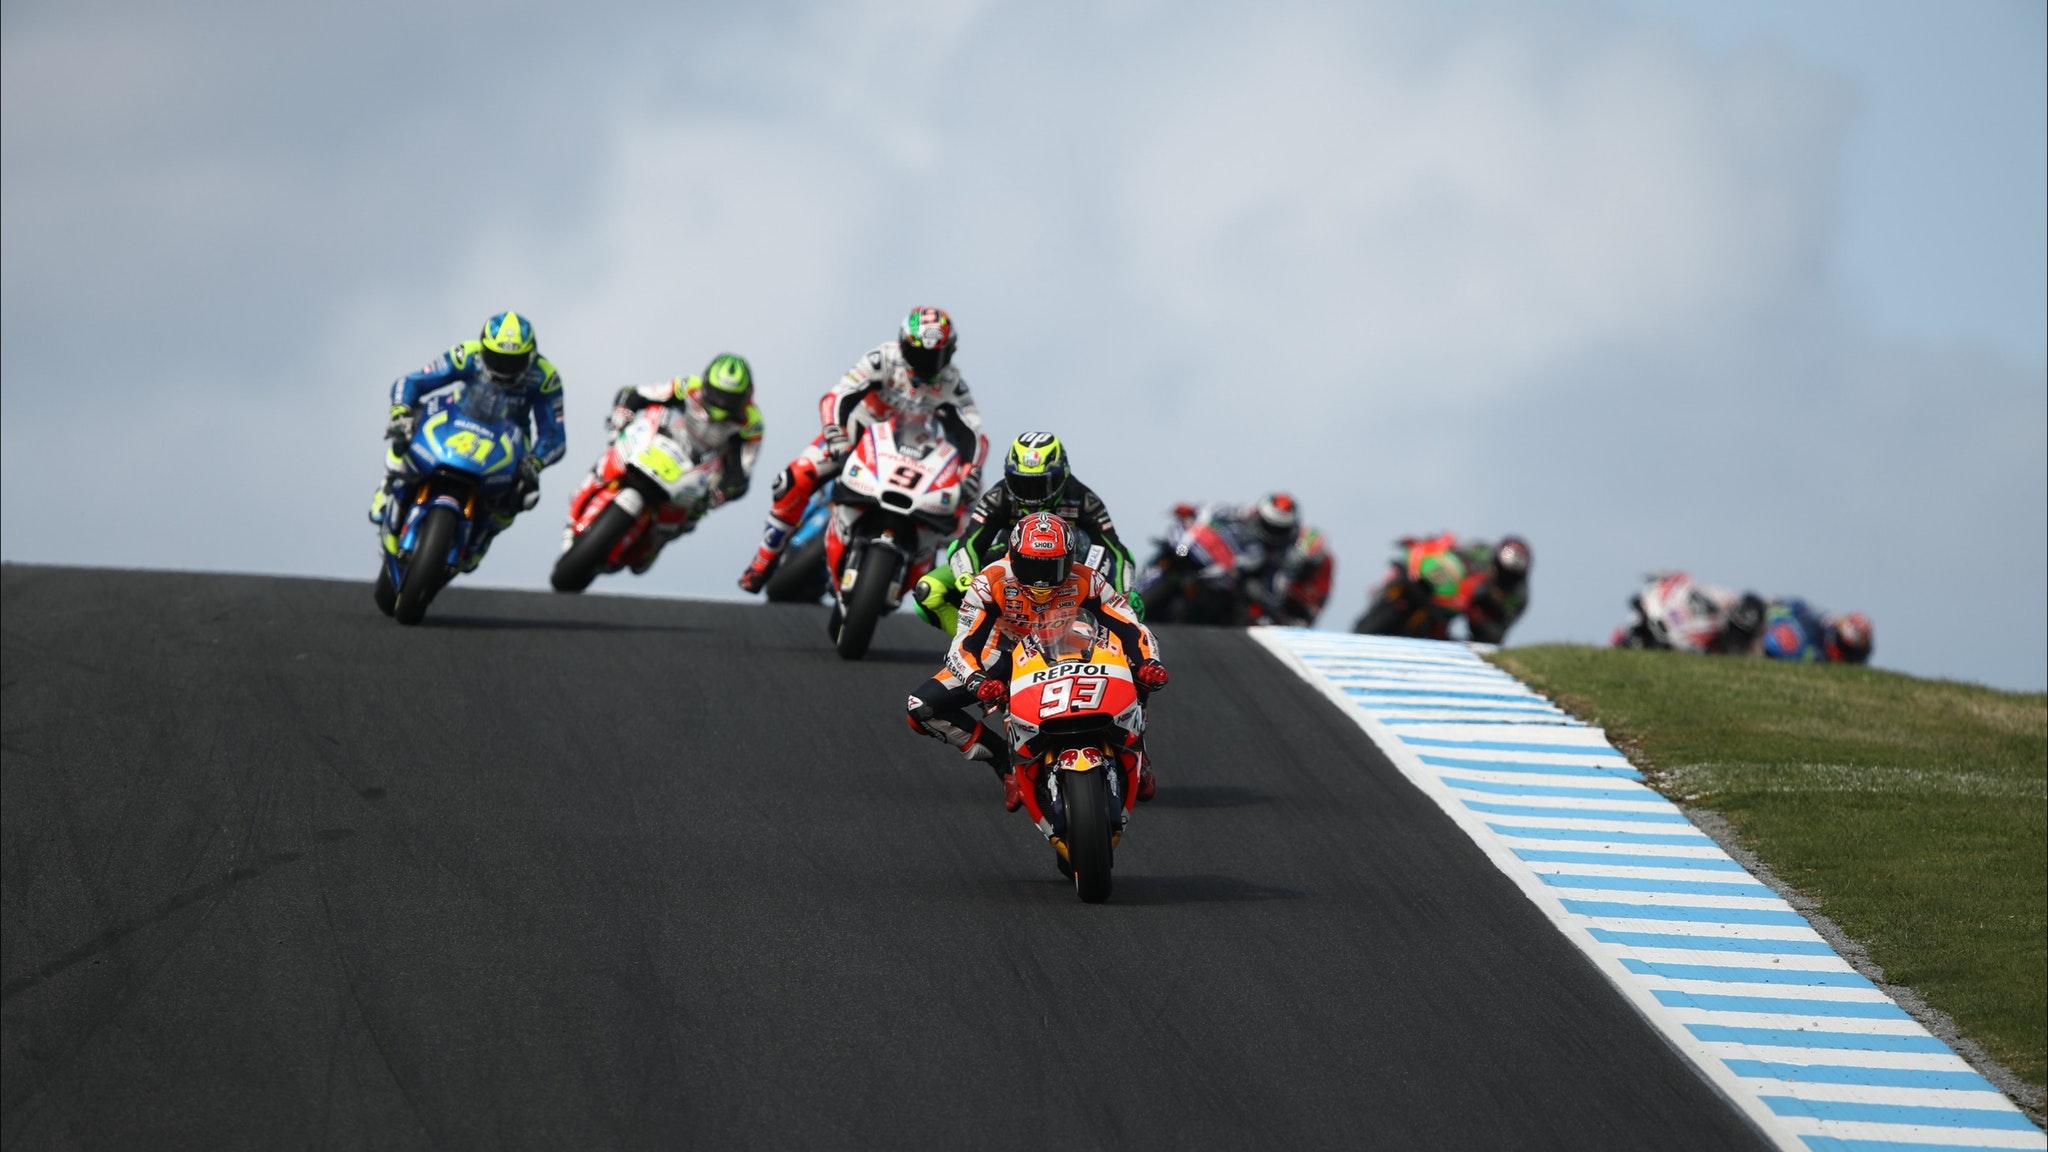 Australian Motorcycle Grand Prix